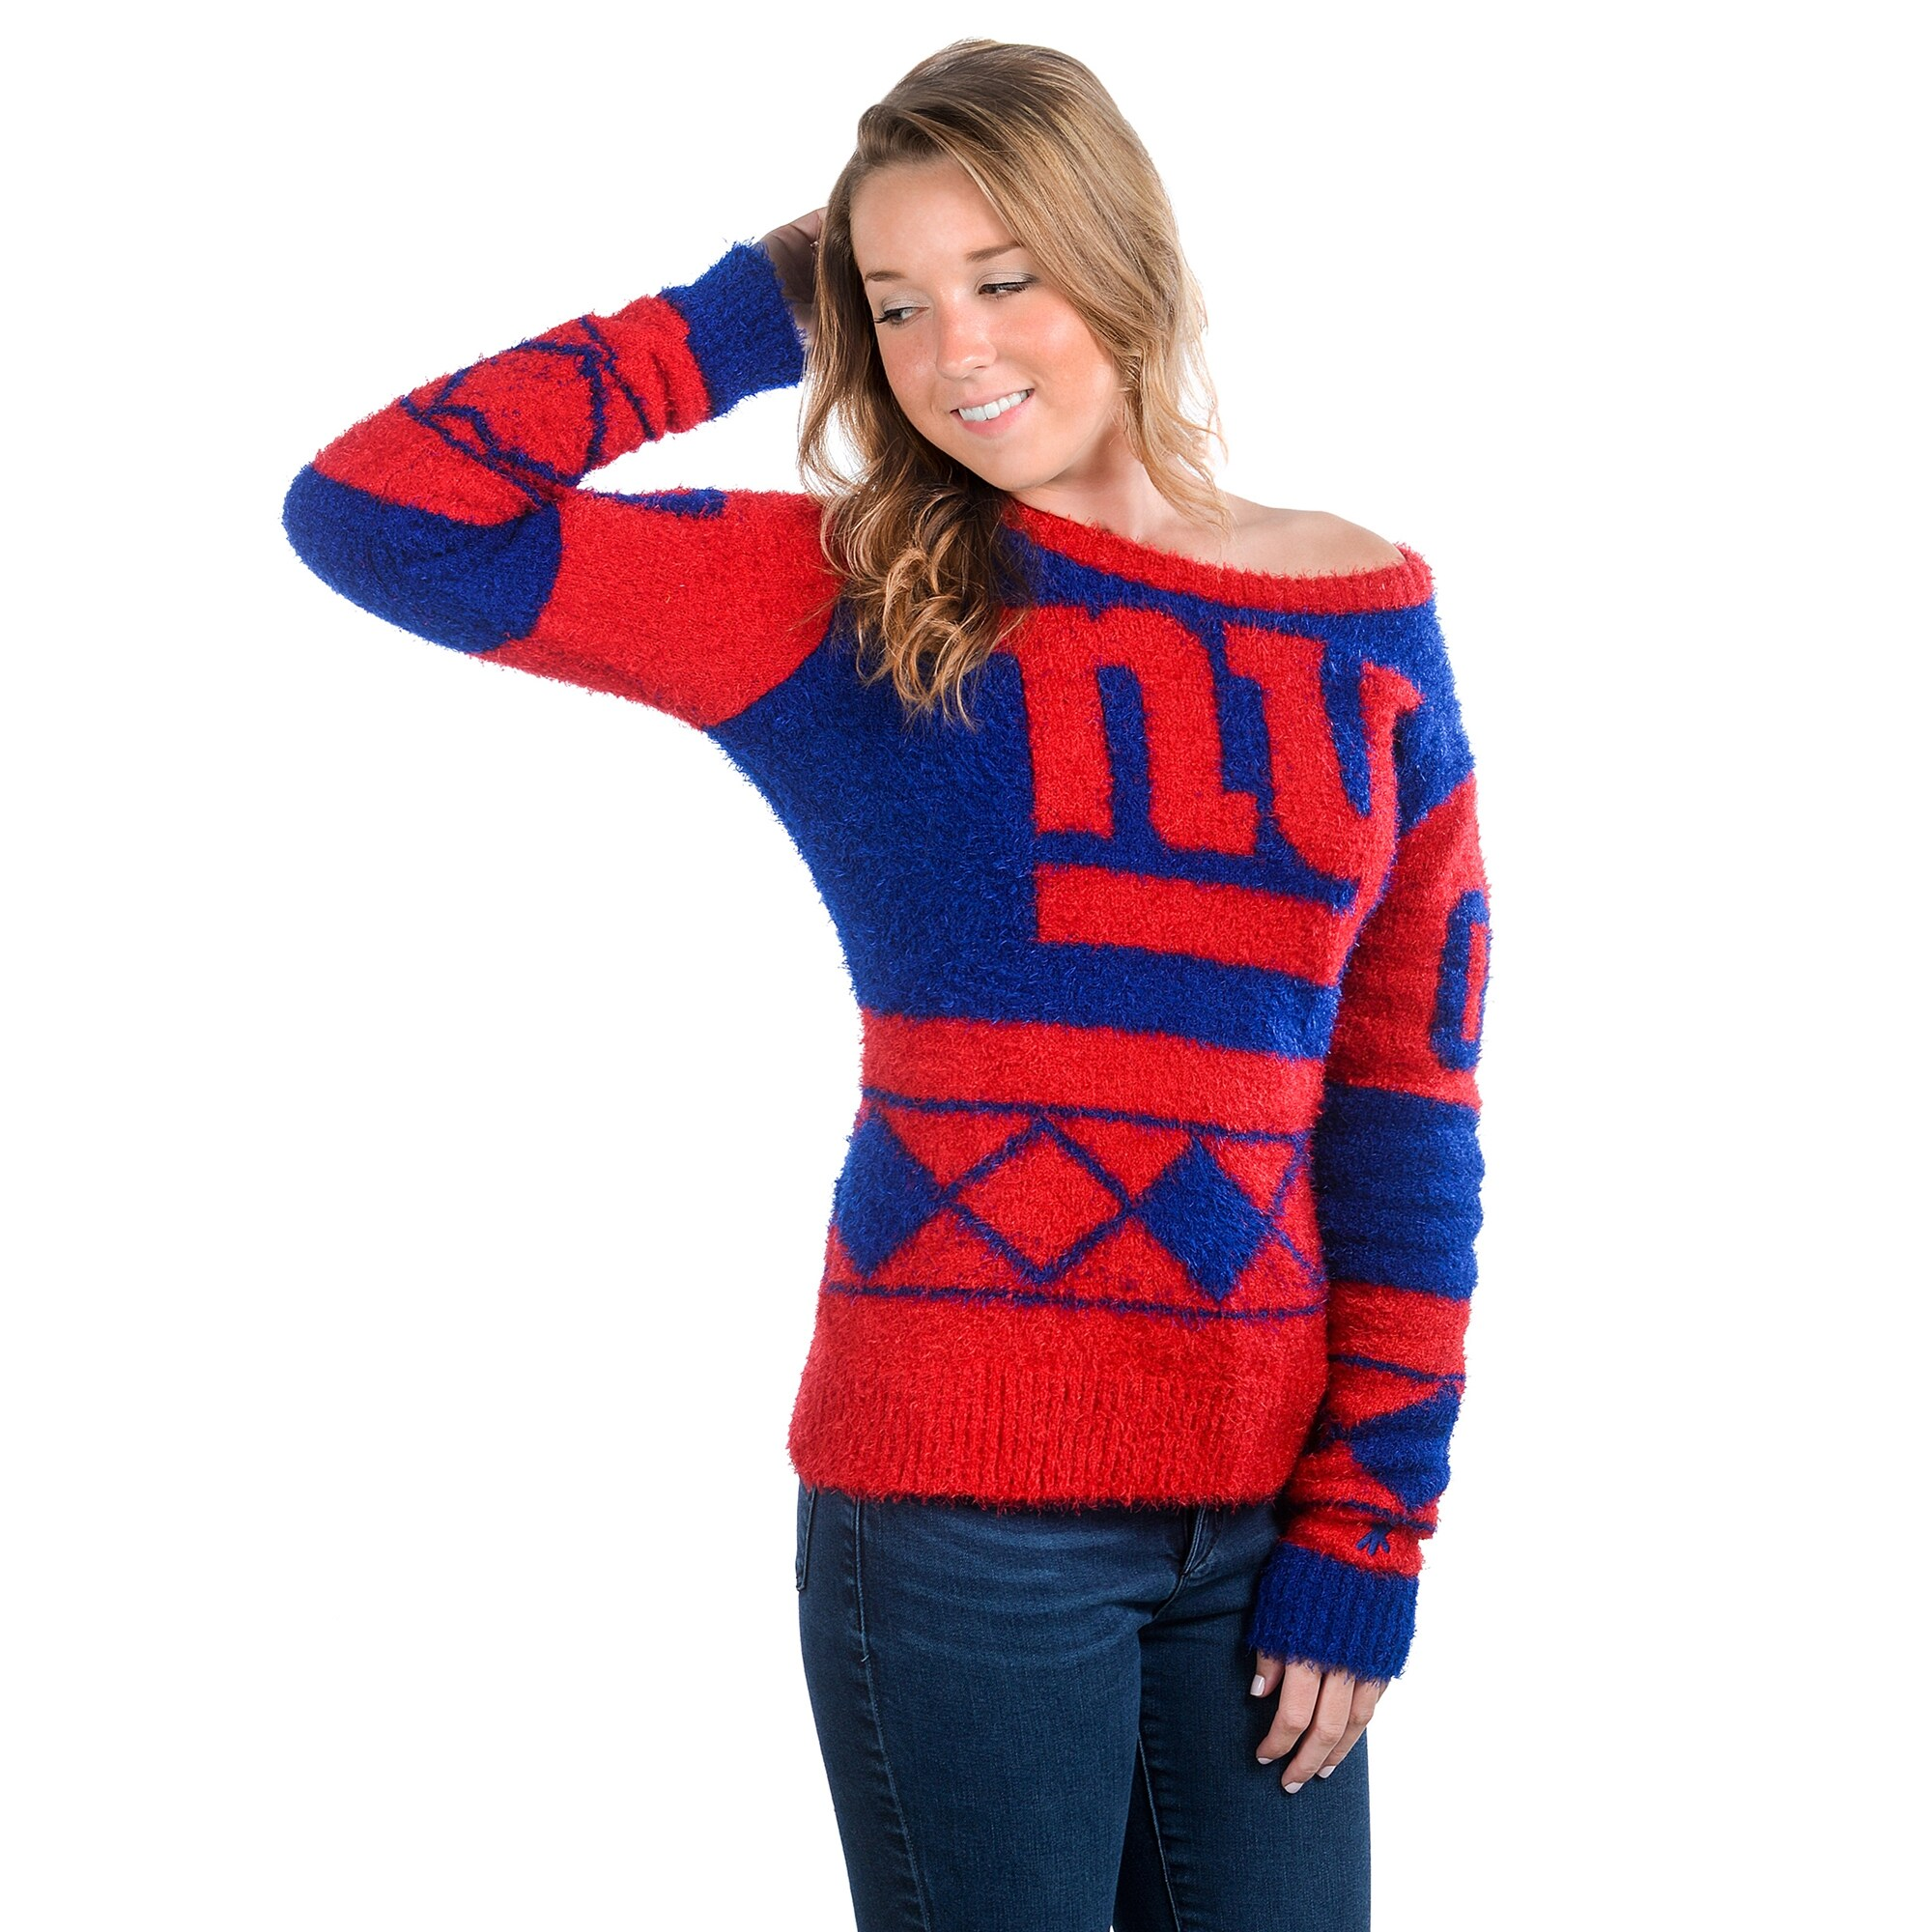 New York Giants Klew Women's Eyelash Crew Ugly Sweater - Royal Blue